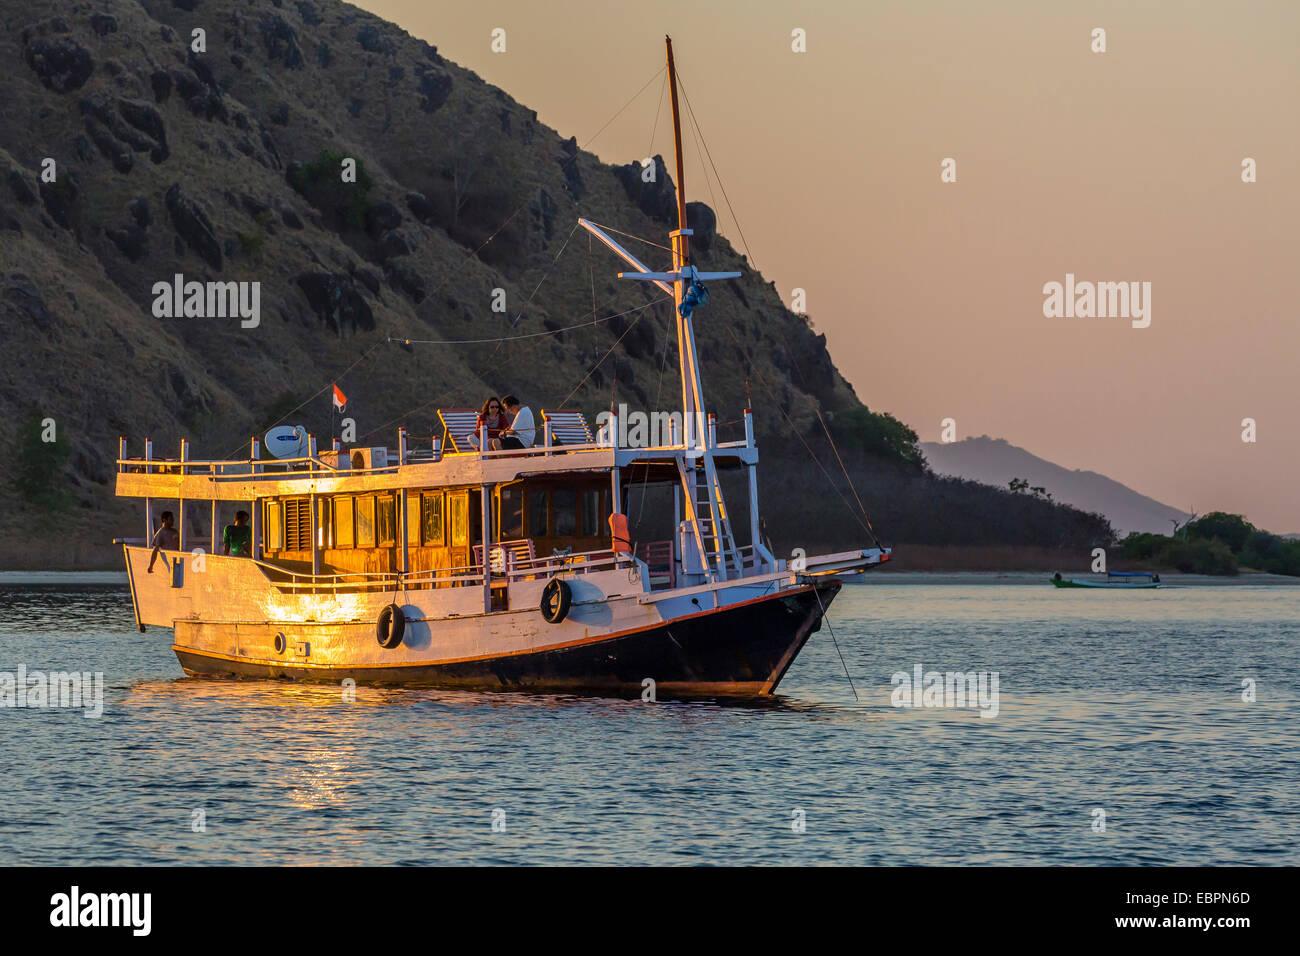 Typical Indonesia wooden boat, Sebayur Island, Komodo Island National Park, Indonesia, Southeast Asia, Asia Stock Photo